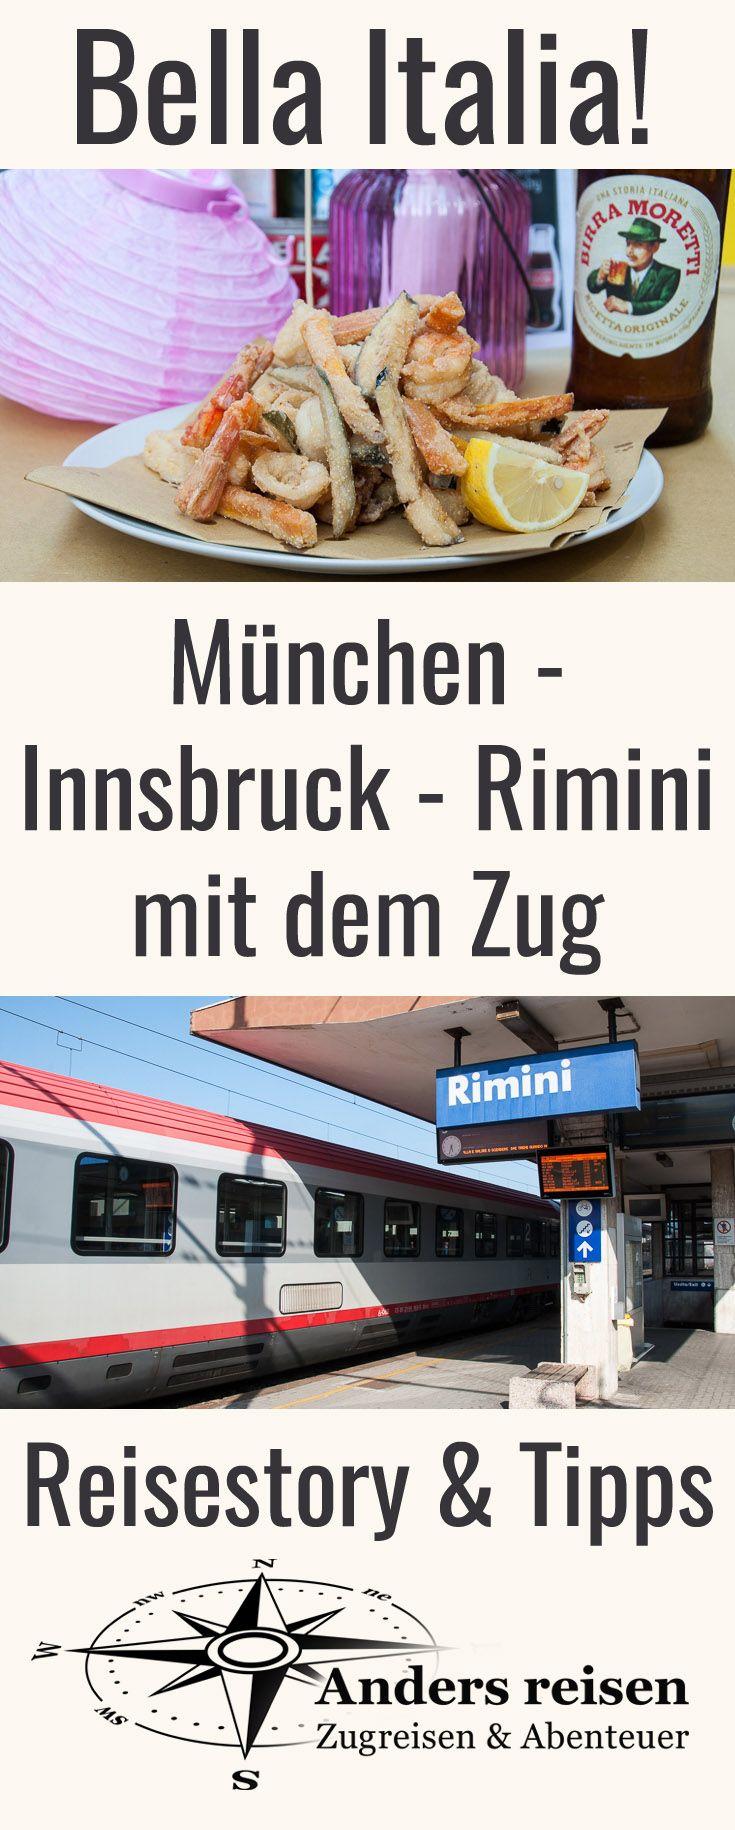 Direkter Zug nach Rimini: Bequem in den Urlaub | Rimini